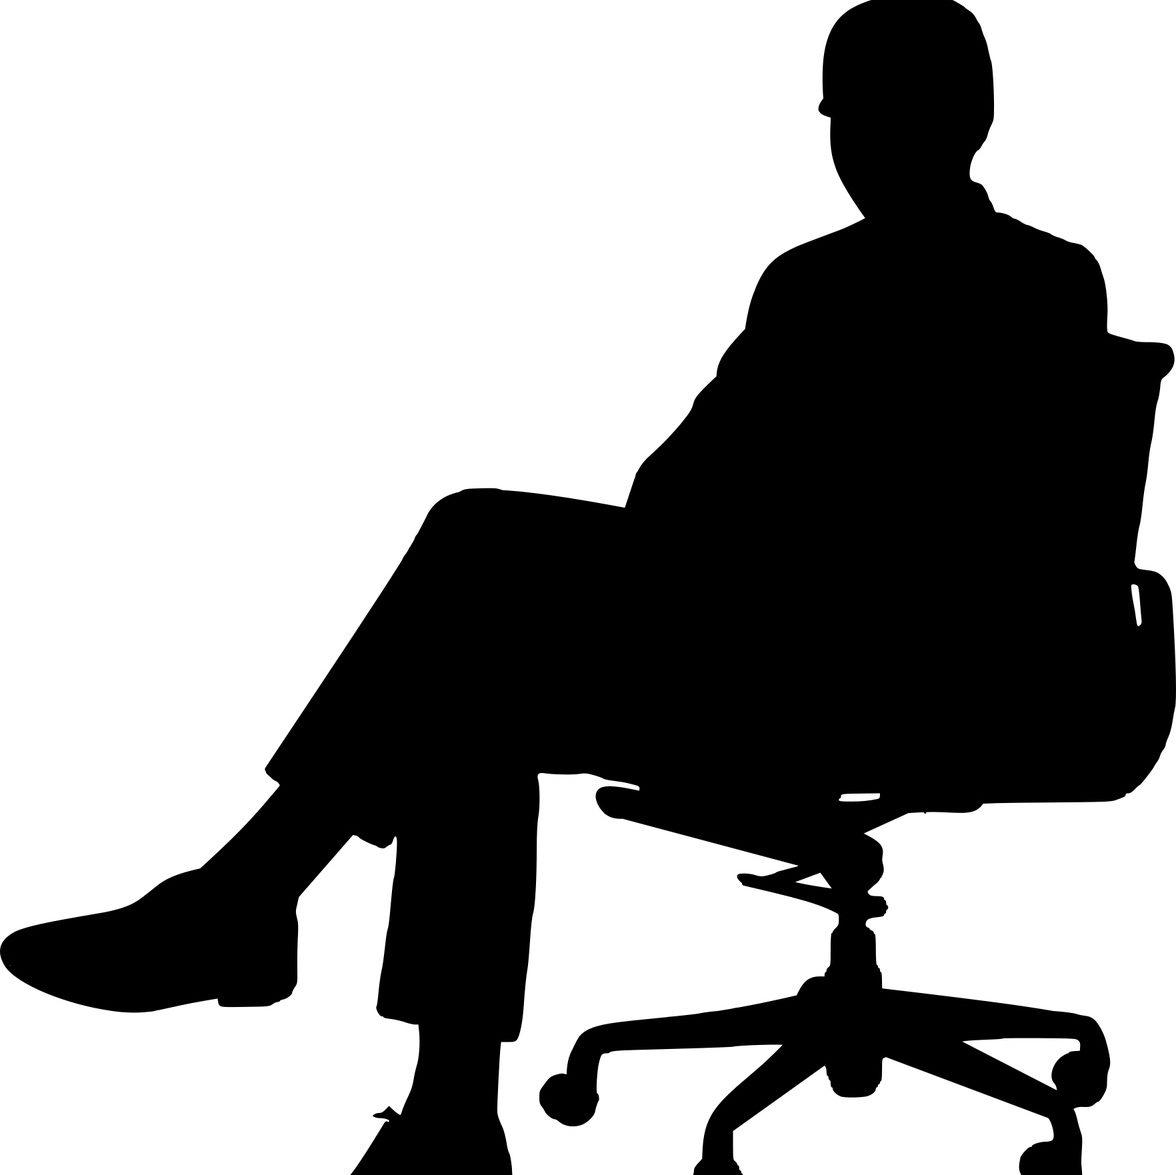 Silhouette of man sitting